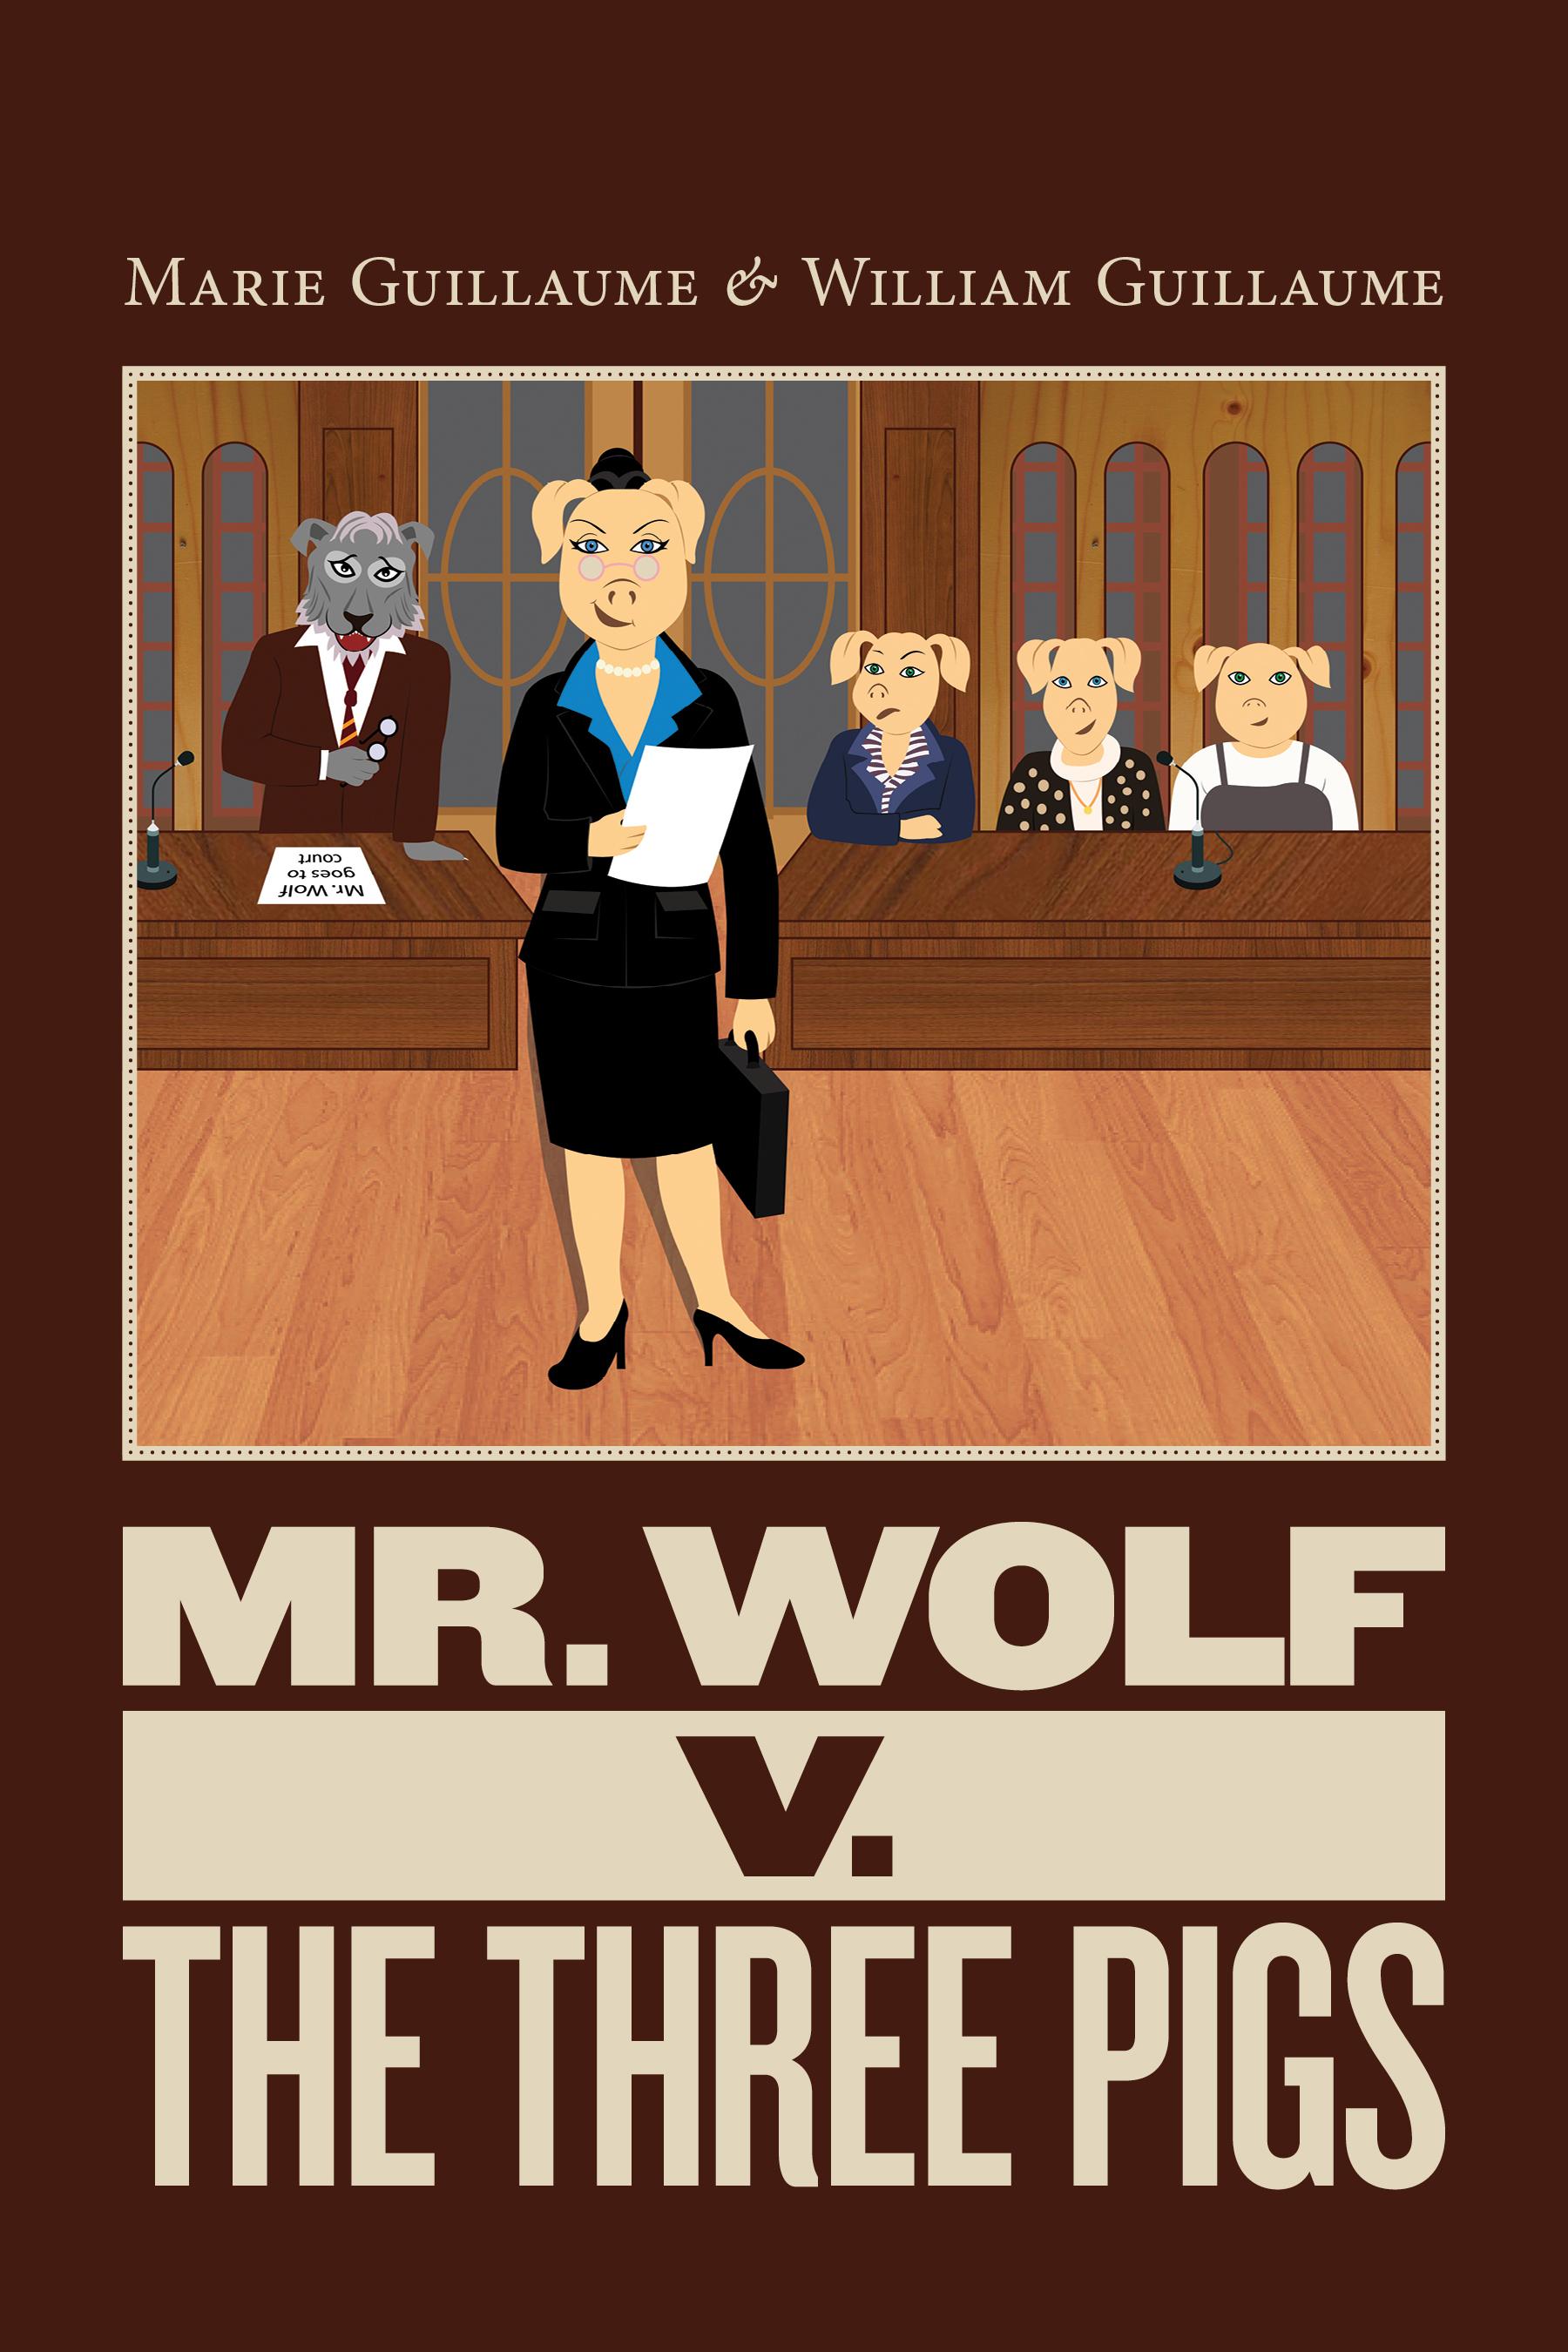 Mr. Wolf v. The Three Pigs